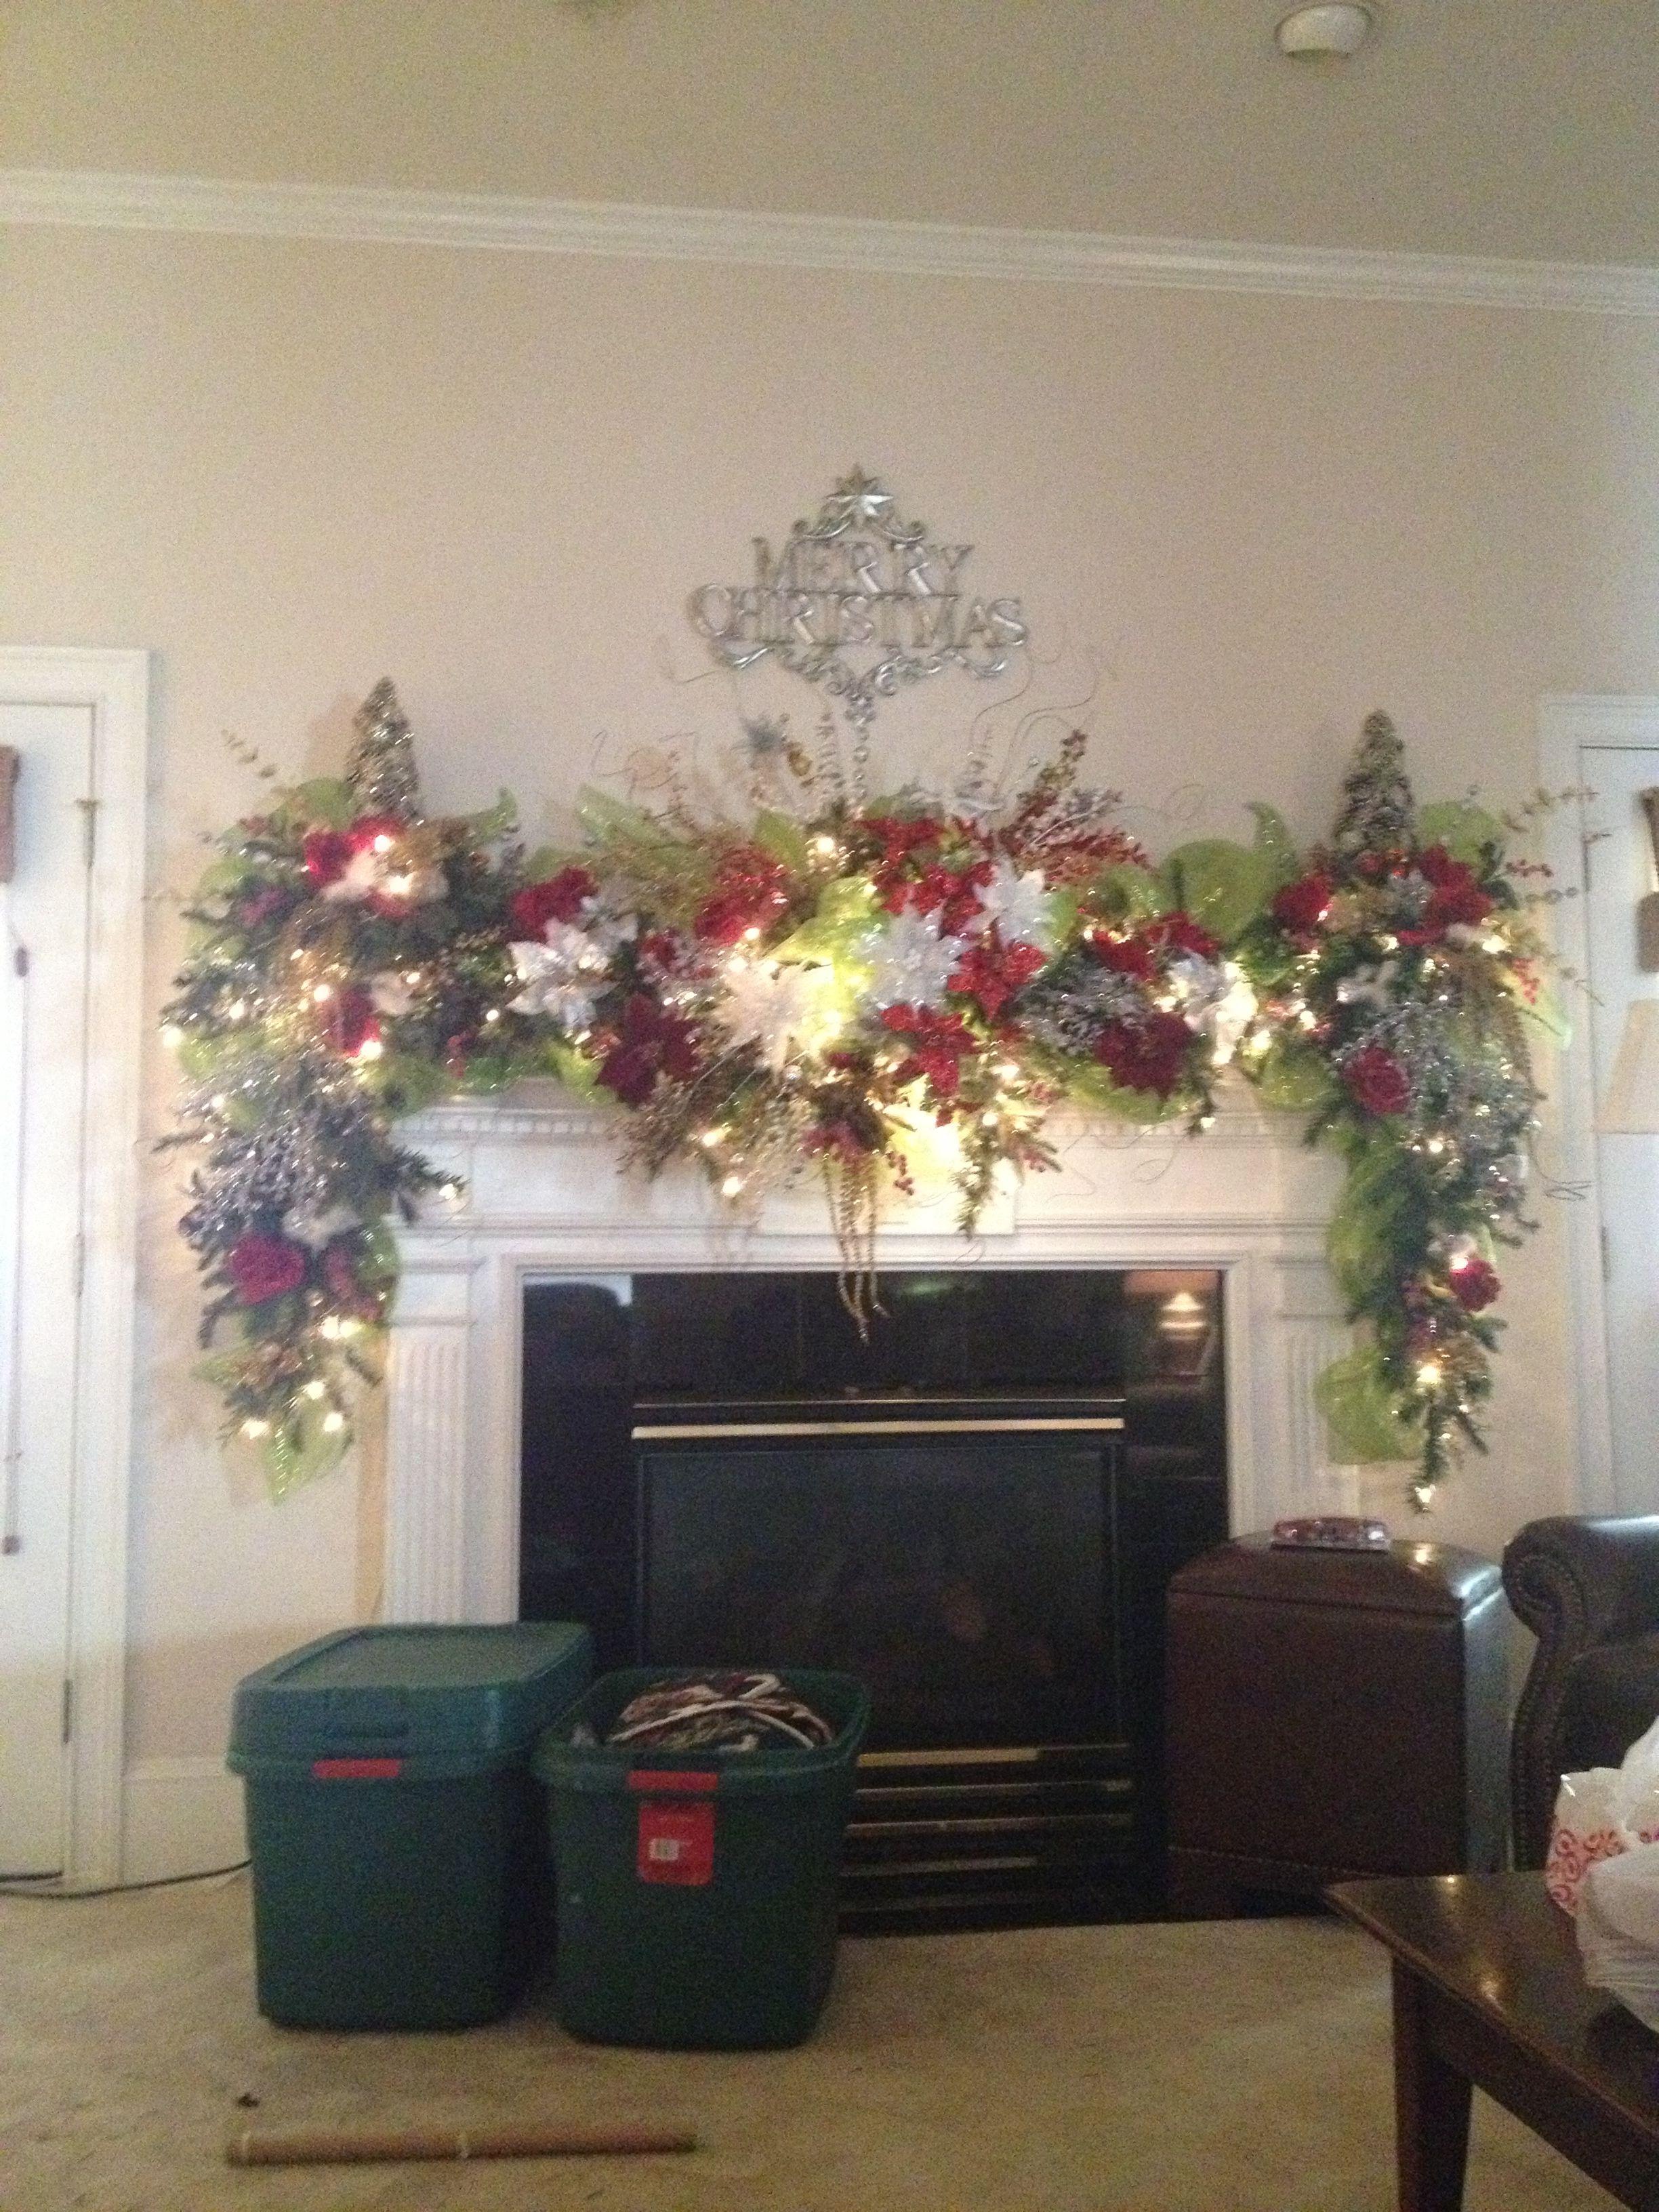 Holiday Decoration | Christmas mantels, Holiday decor, Holiday